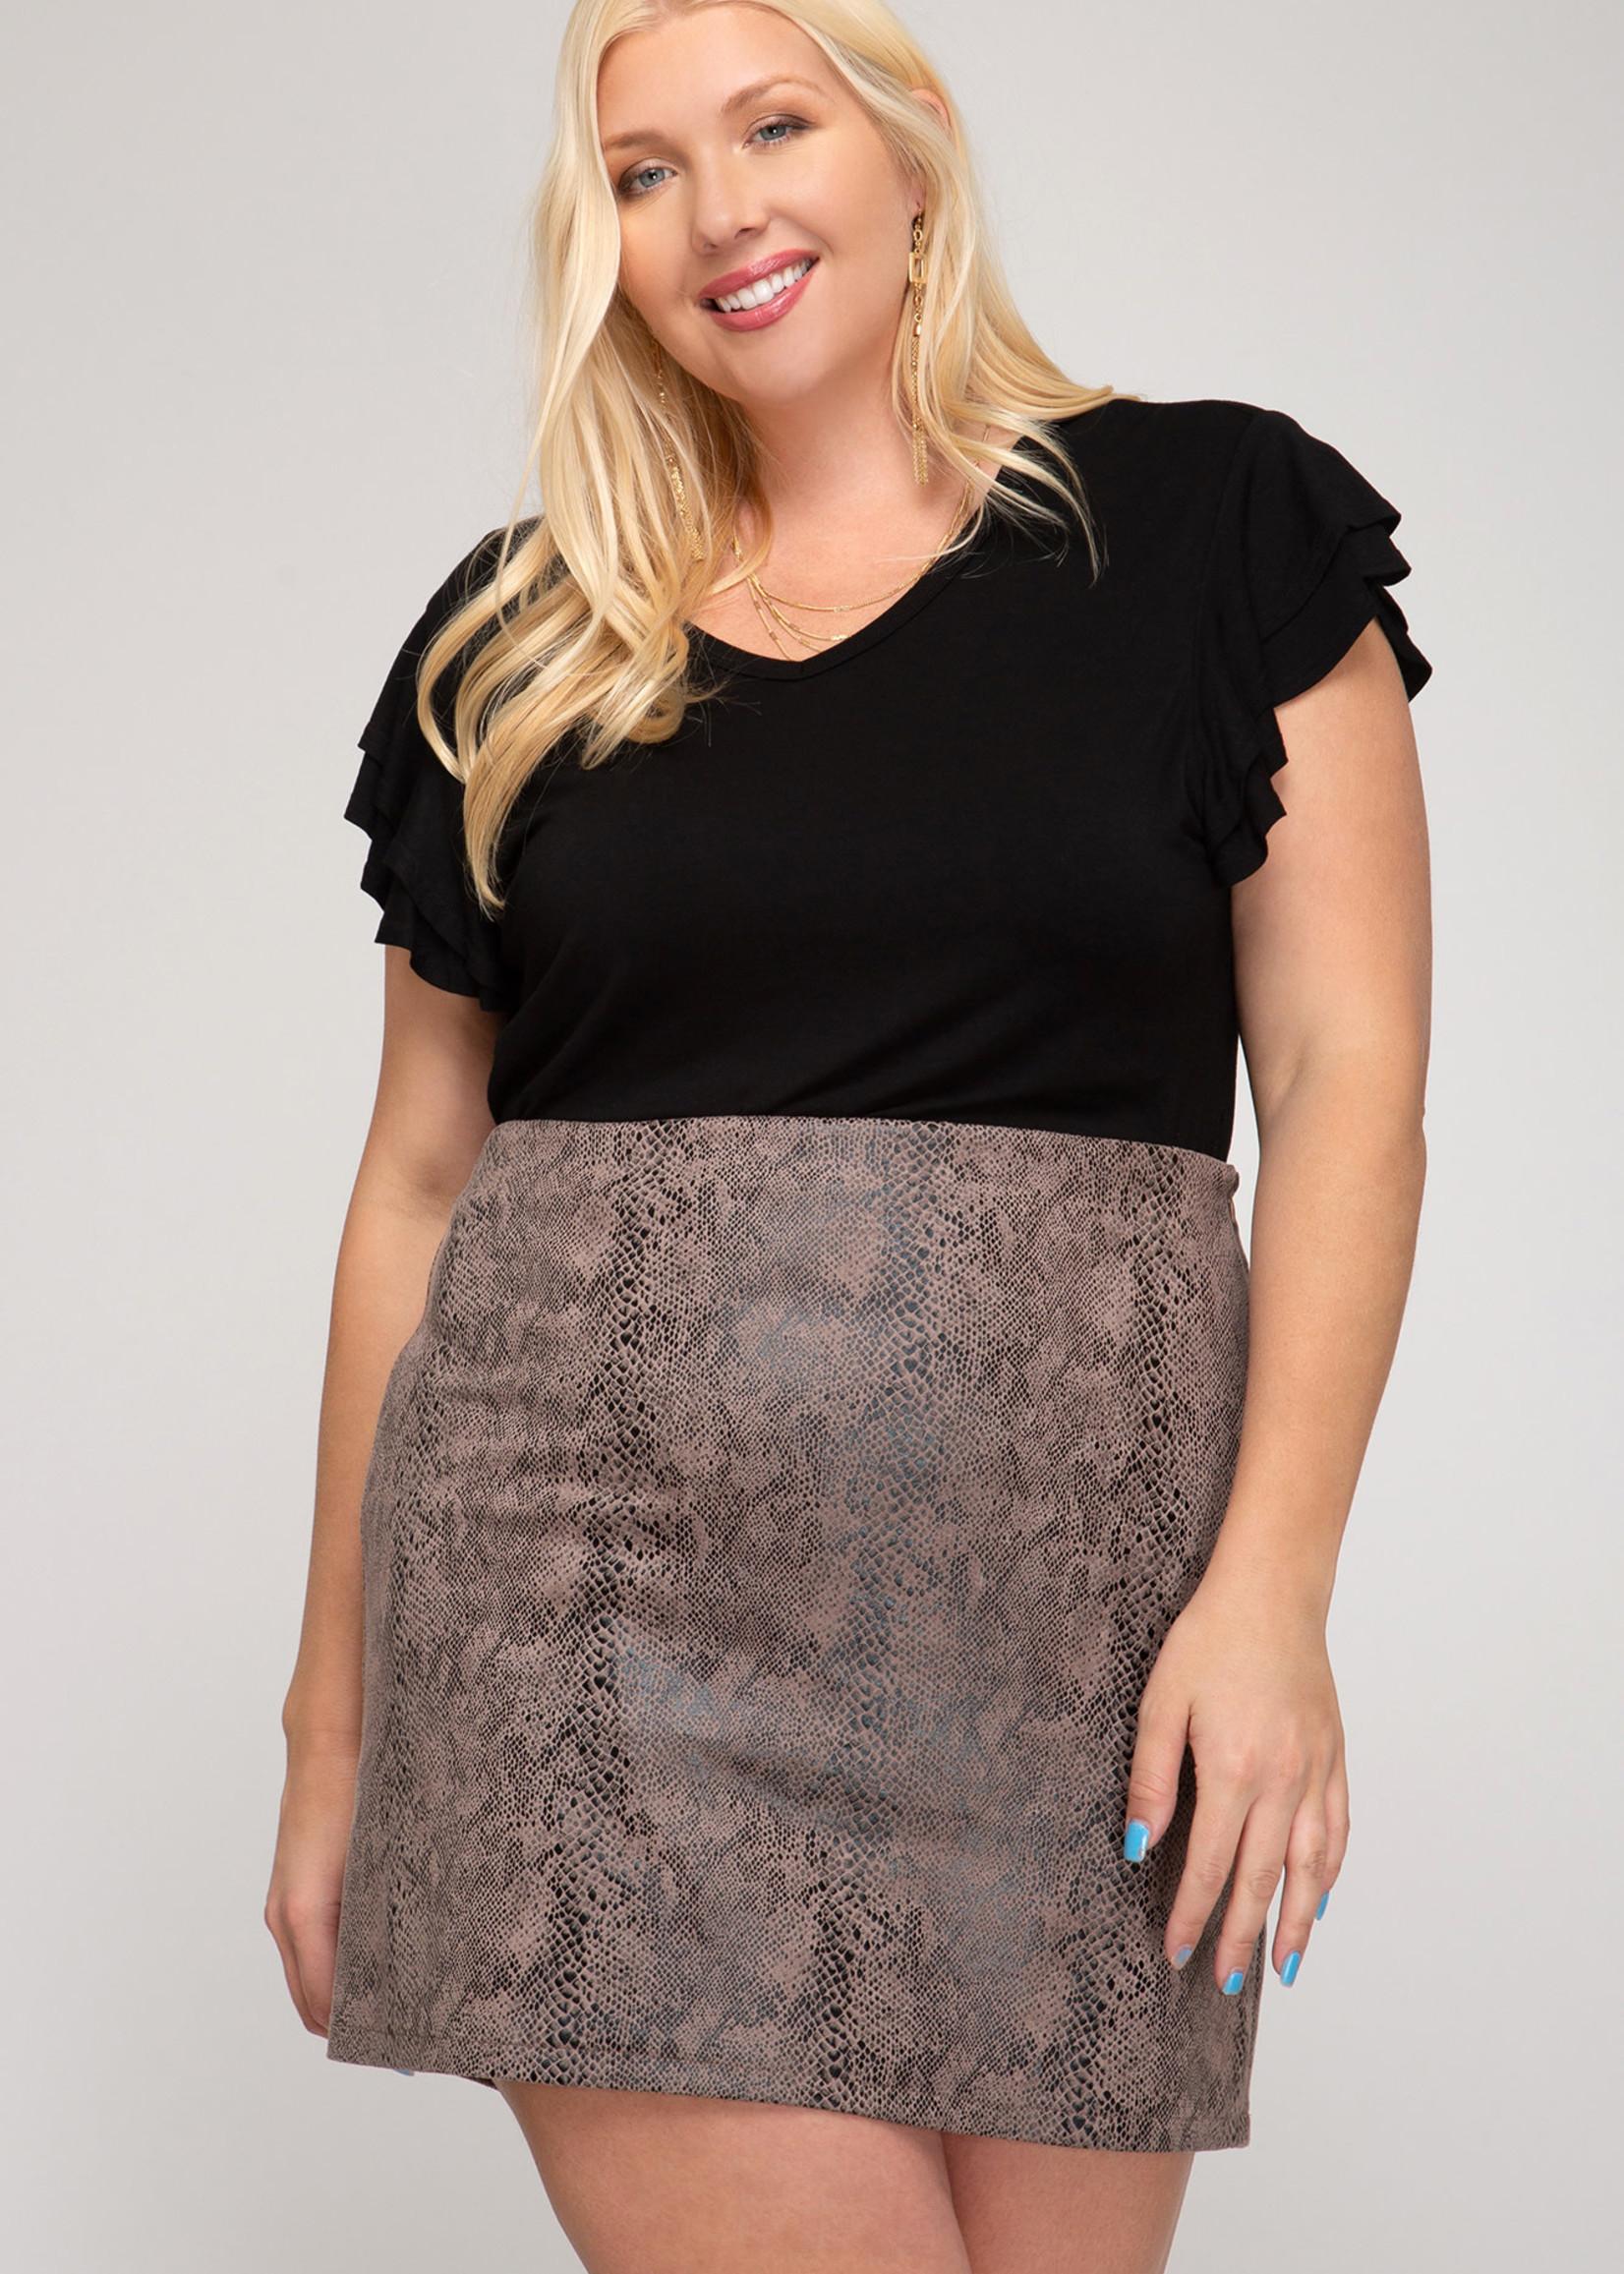 Snake Skin Print Faux Suede Mini Skirt